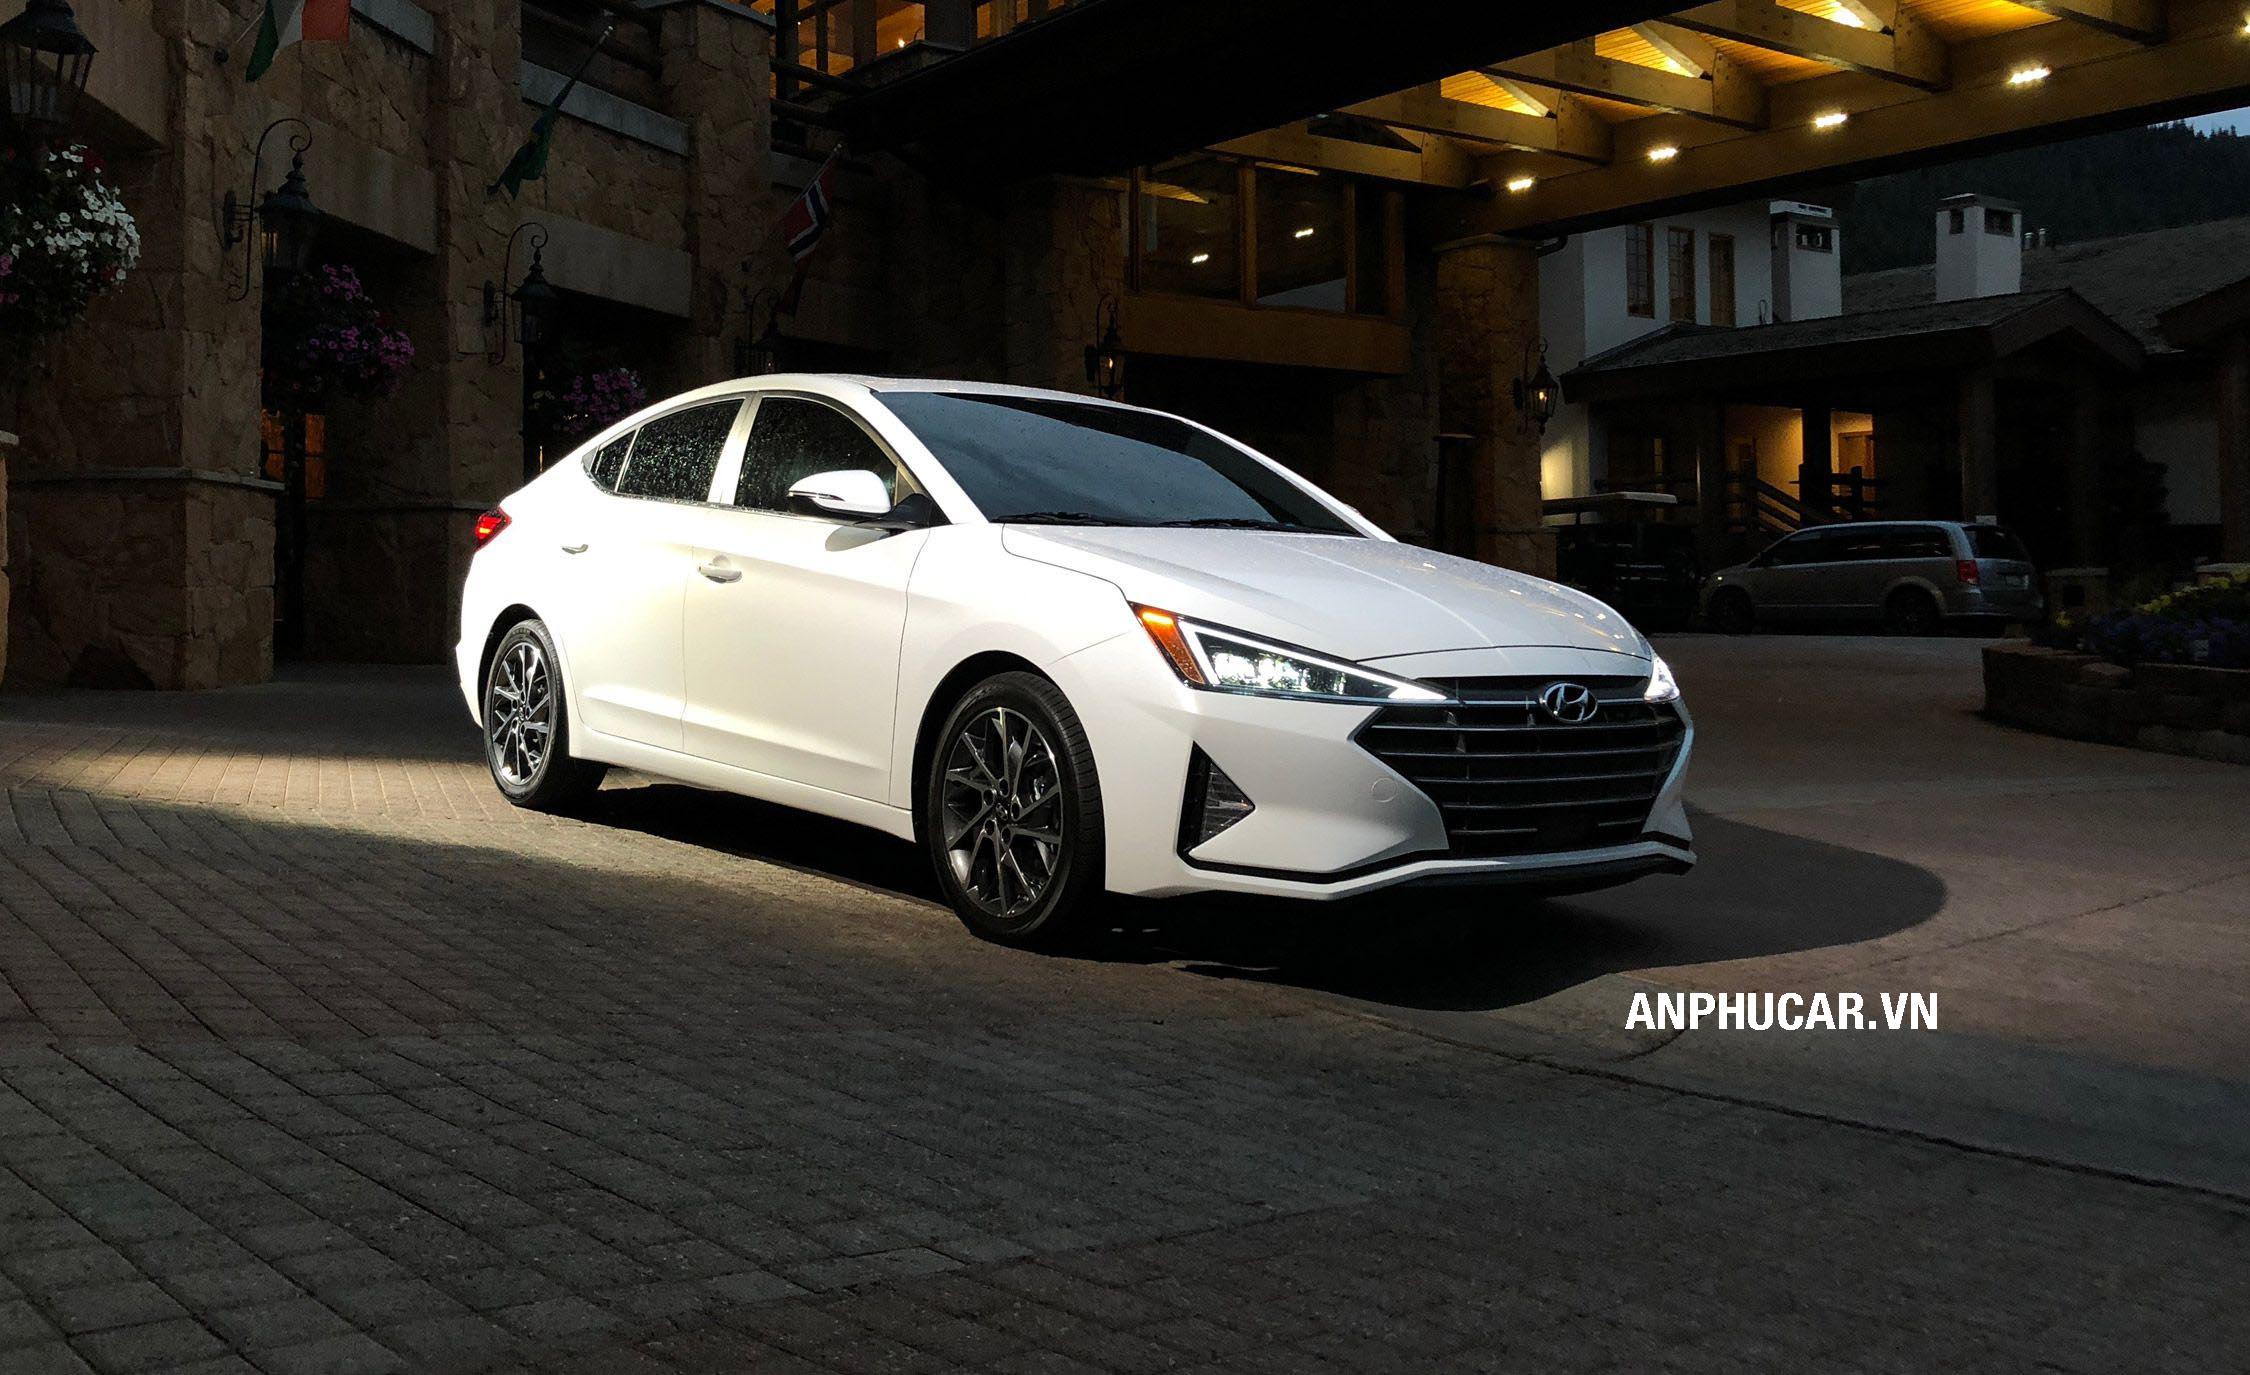 Đánh giá xe Hyundai Elantra 2020